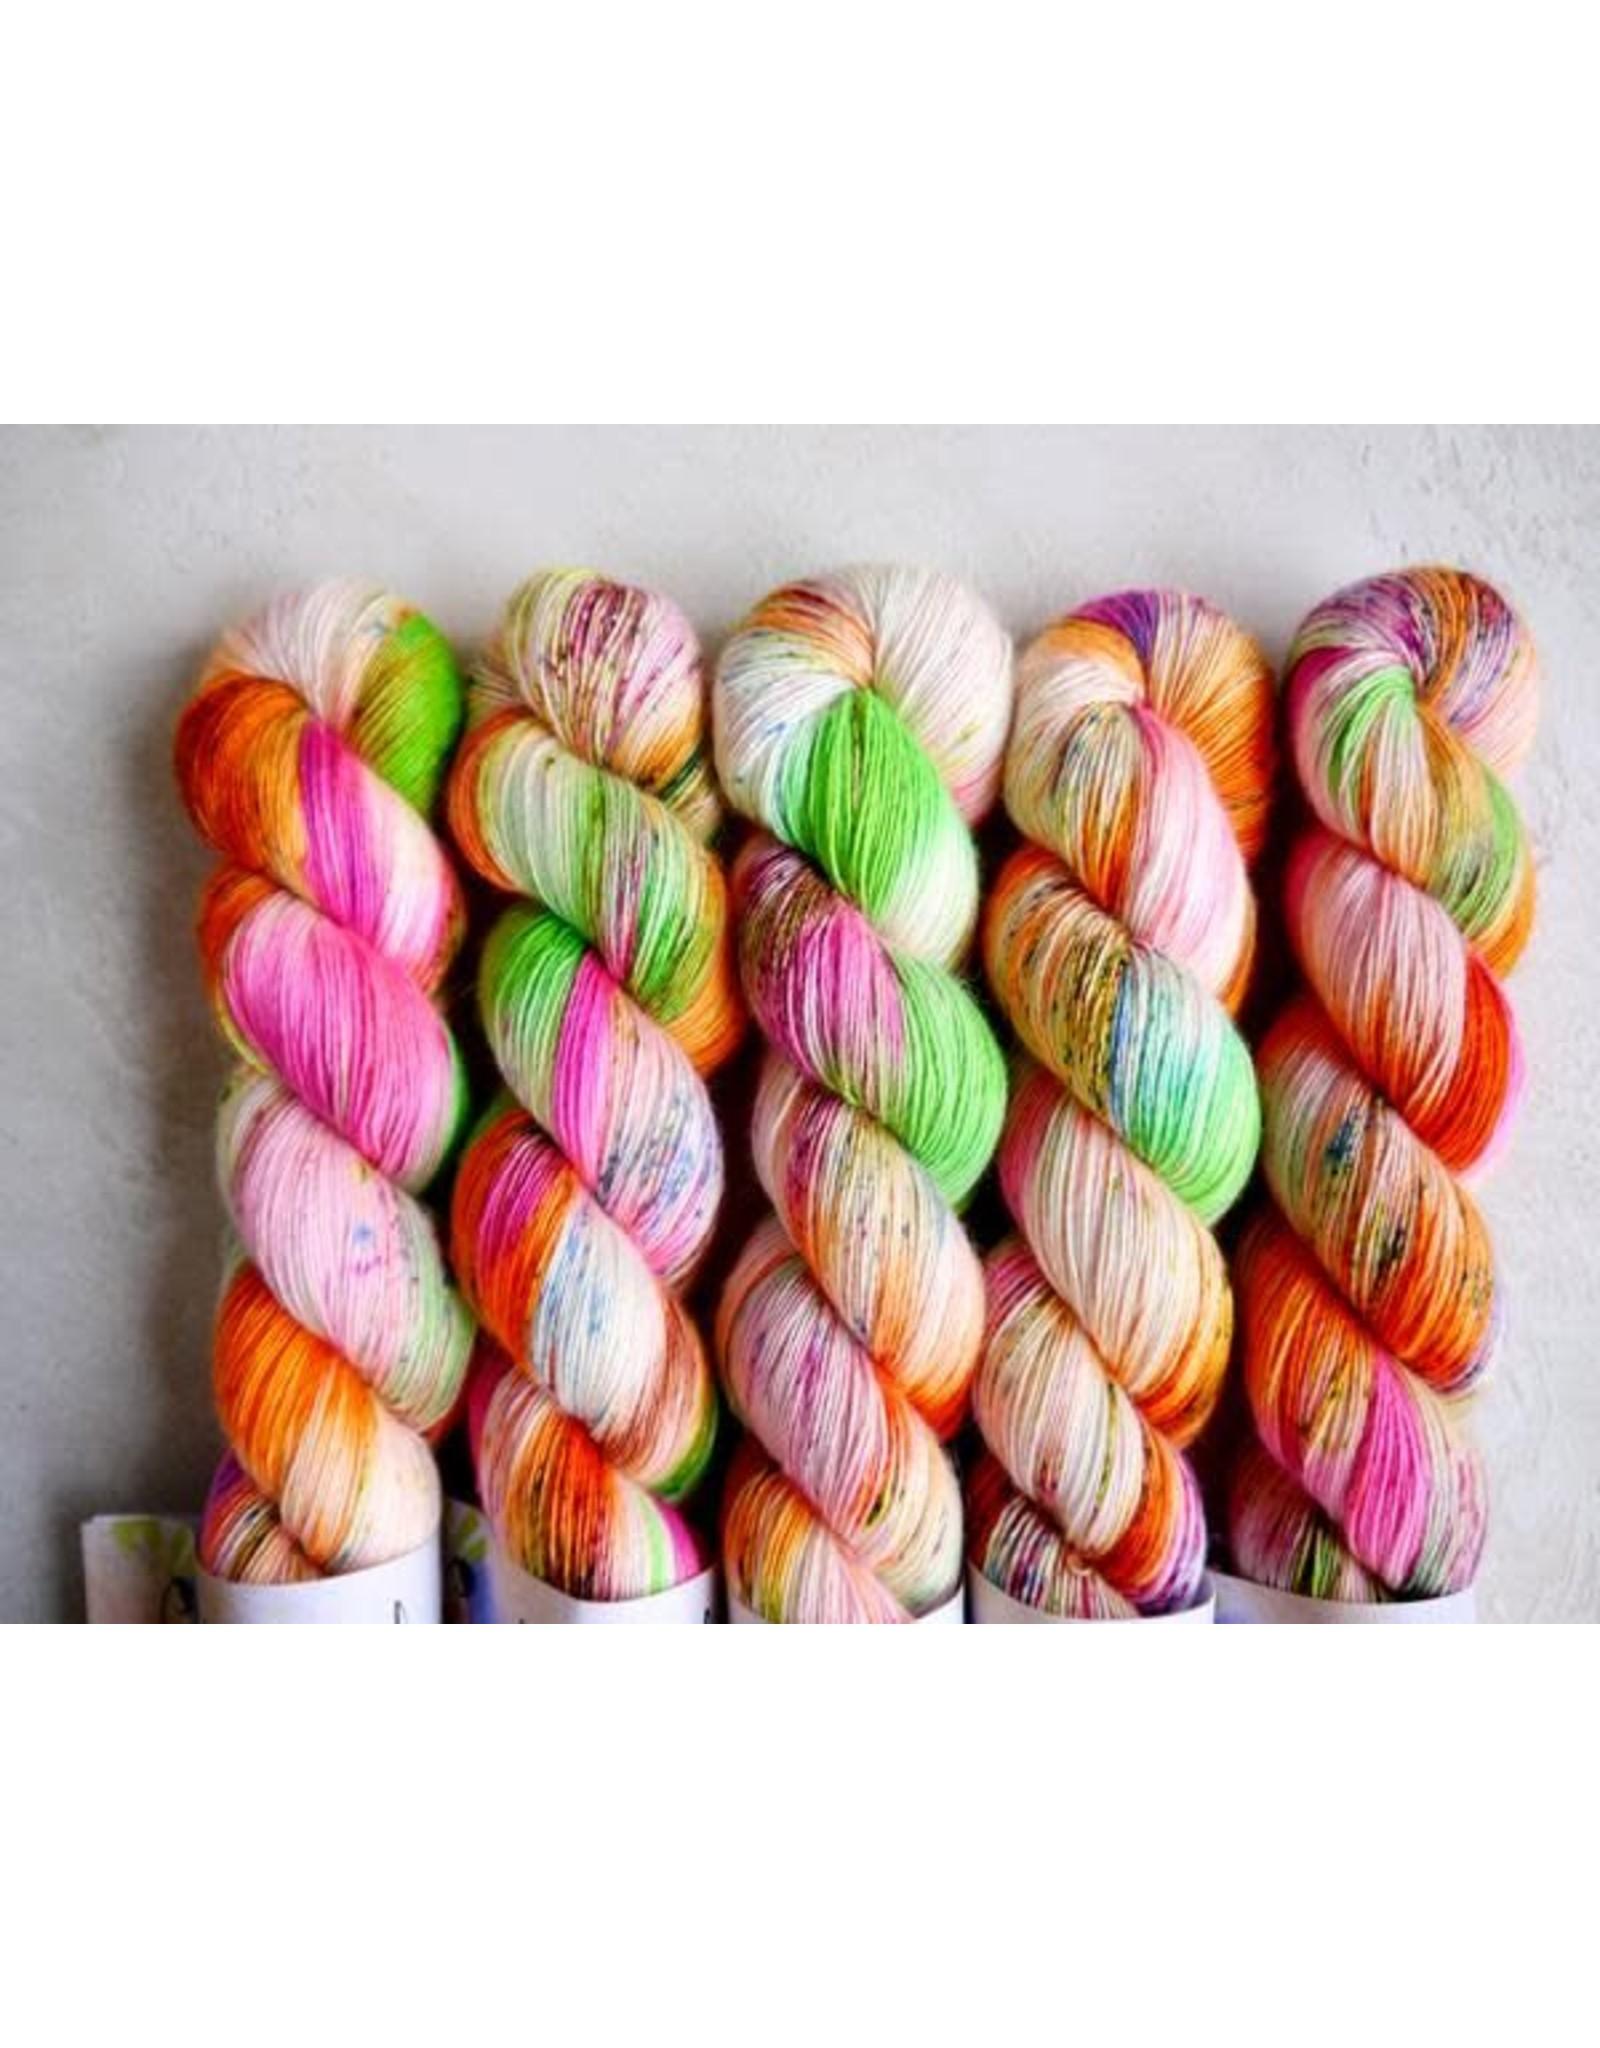 Qing Fibre Bronx (Shangri-la collection) - Silky Merino Singles - Qing Fibre